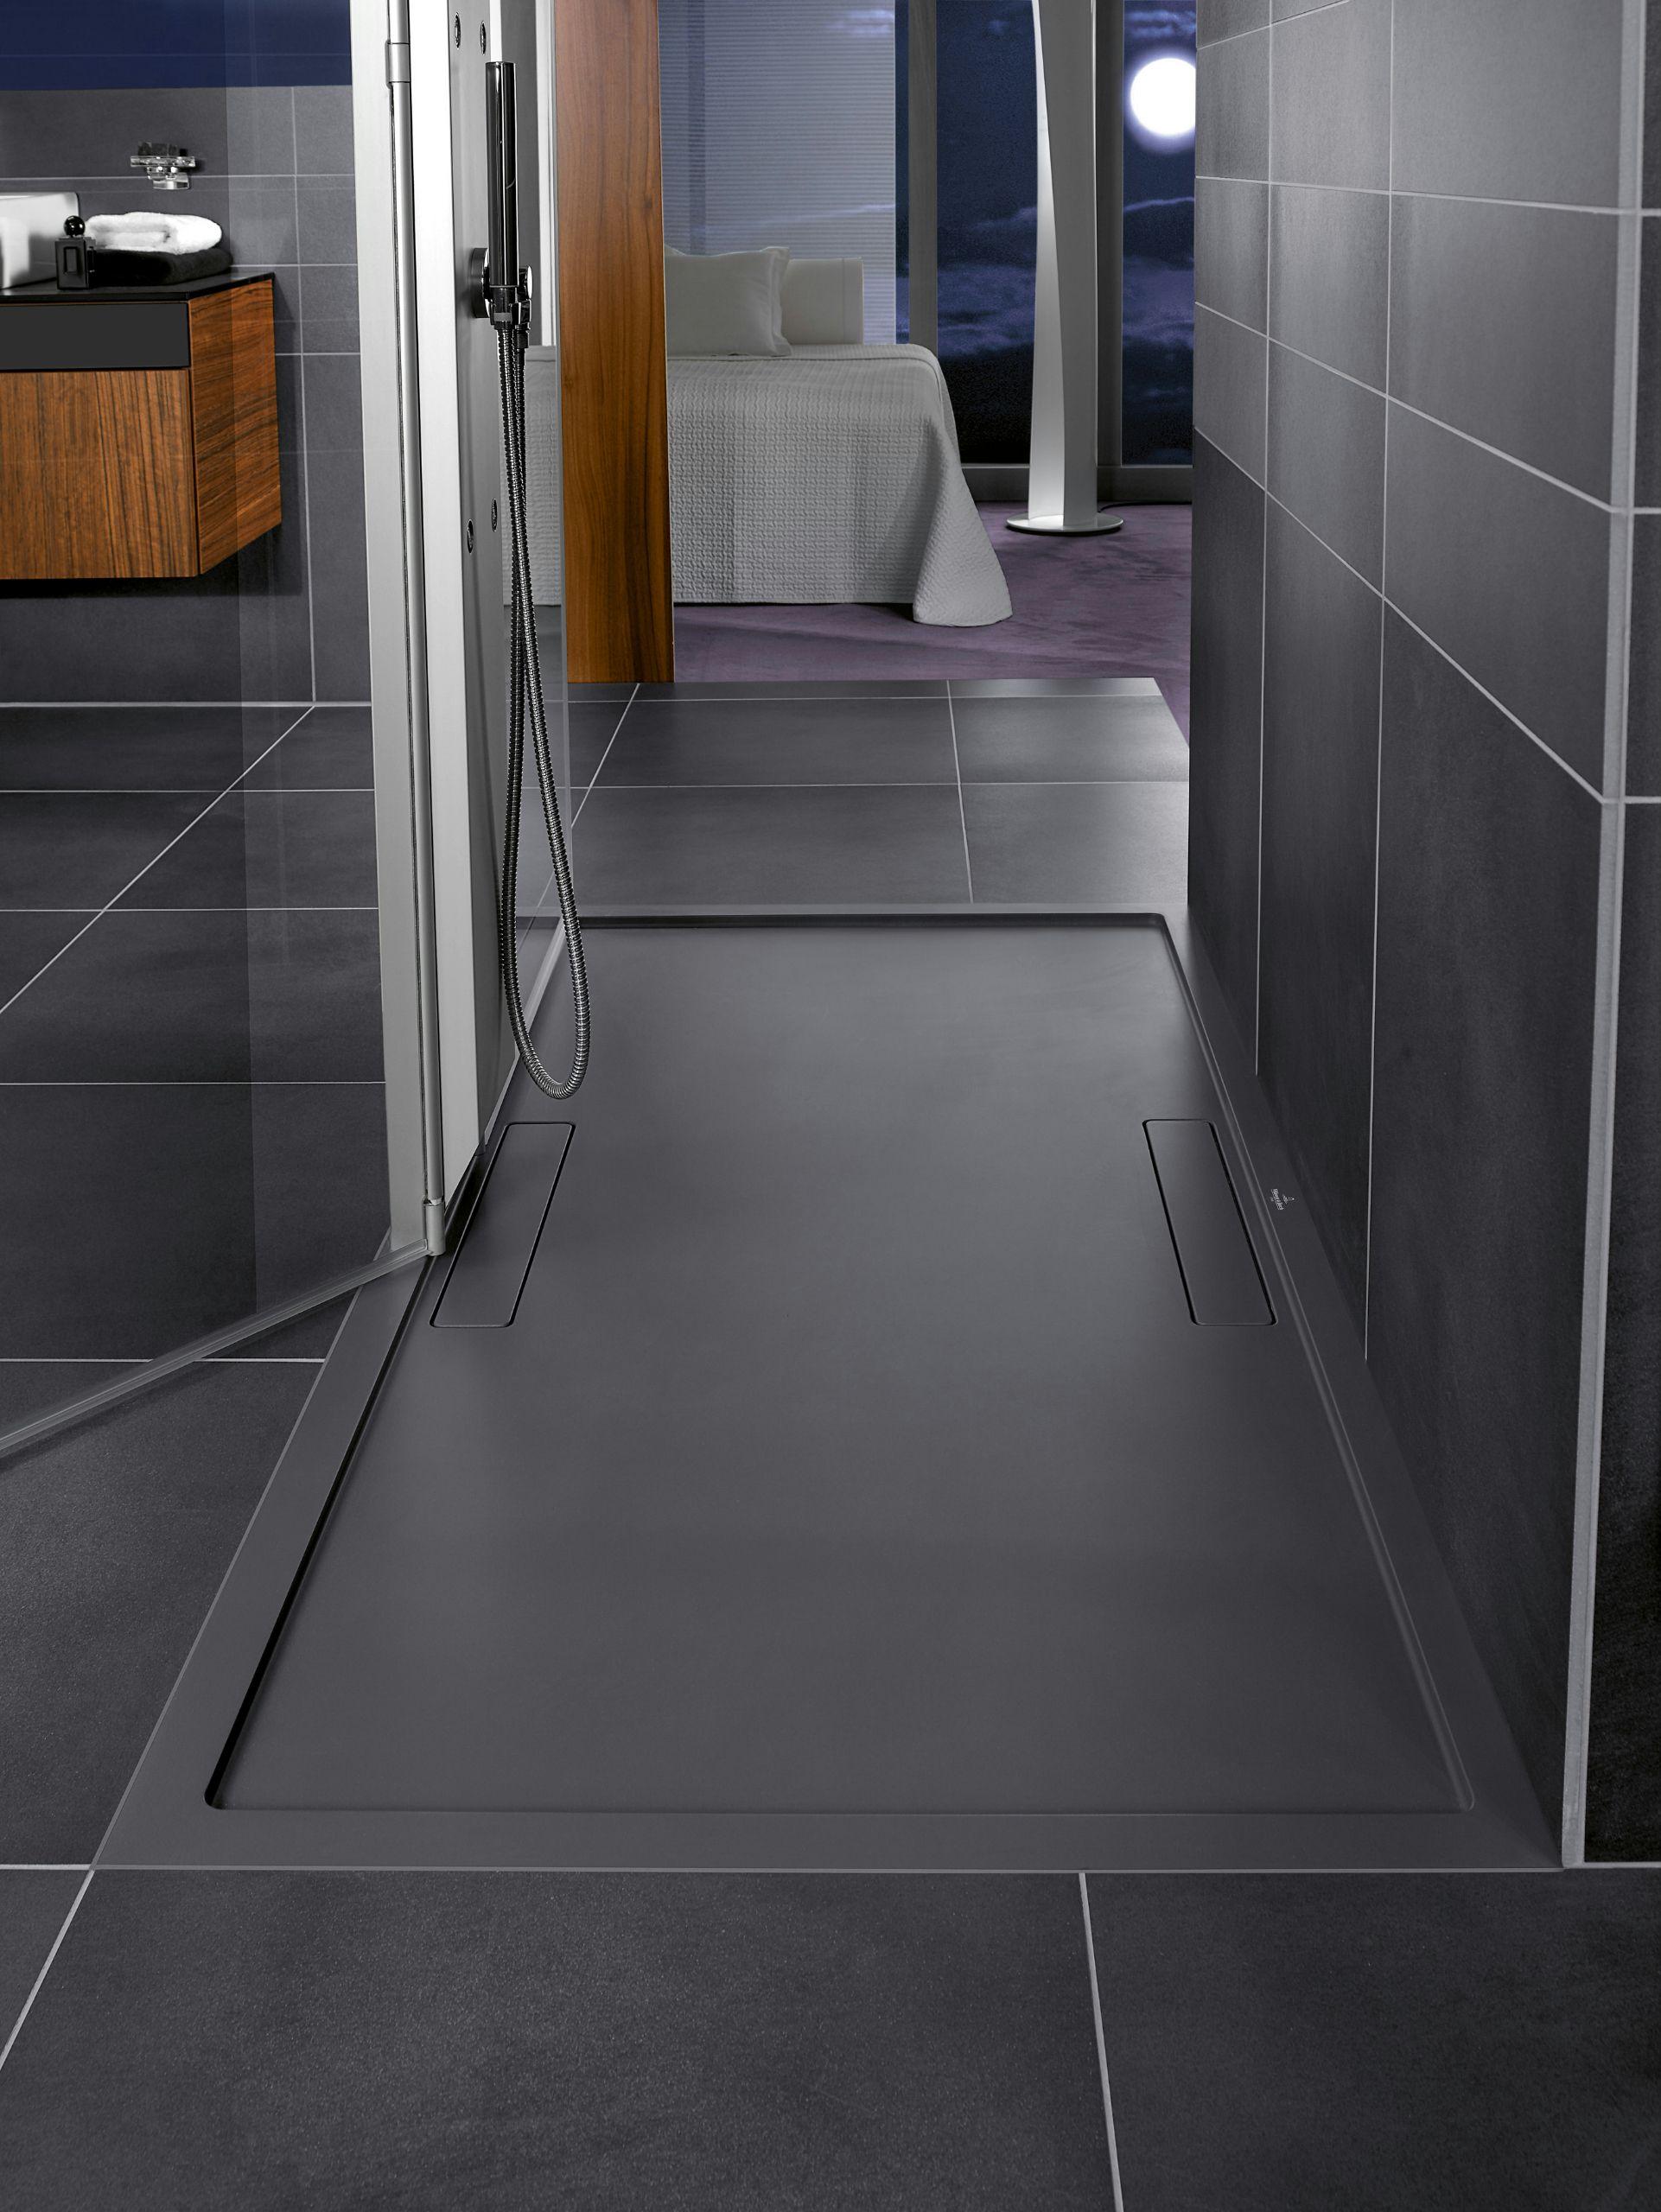 Squaro Shower Tray By Villeroy Shower Tray Bathroom Shower Room